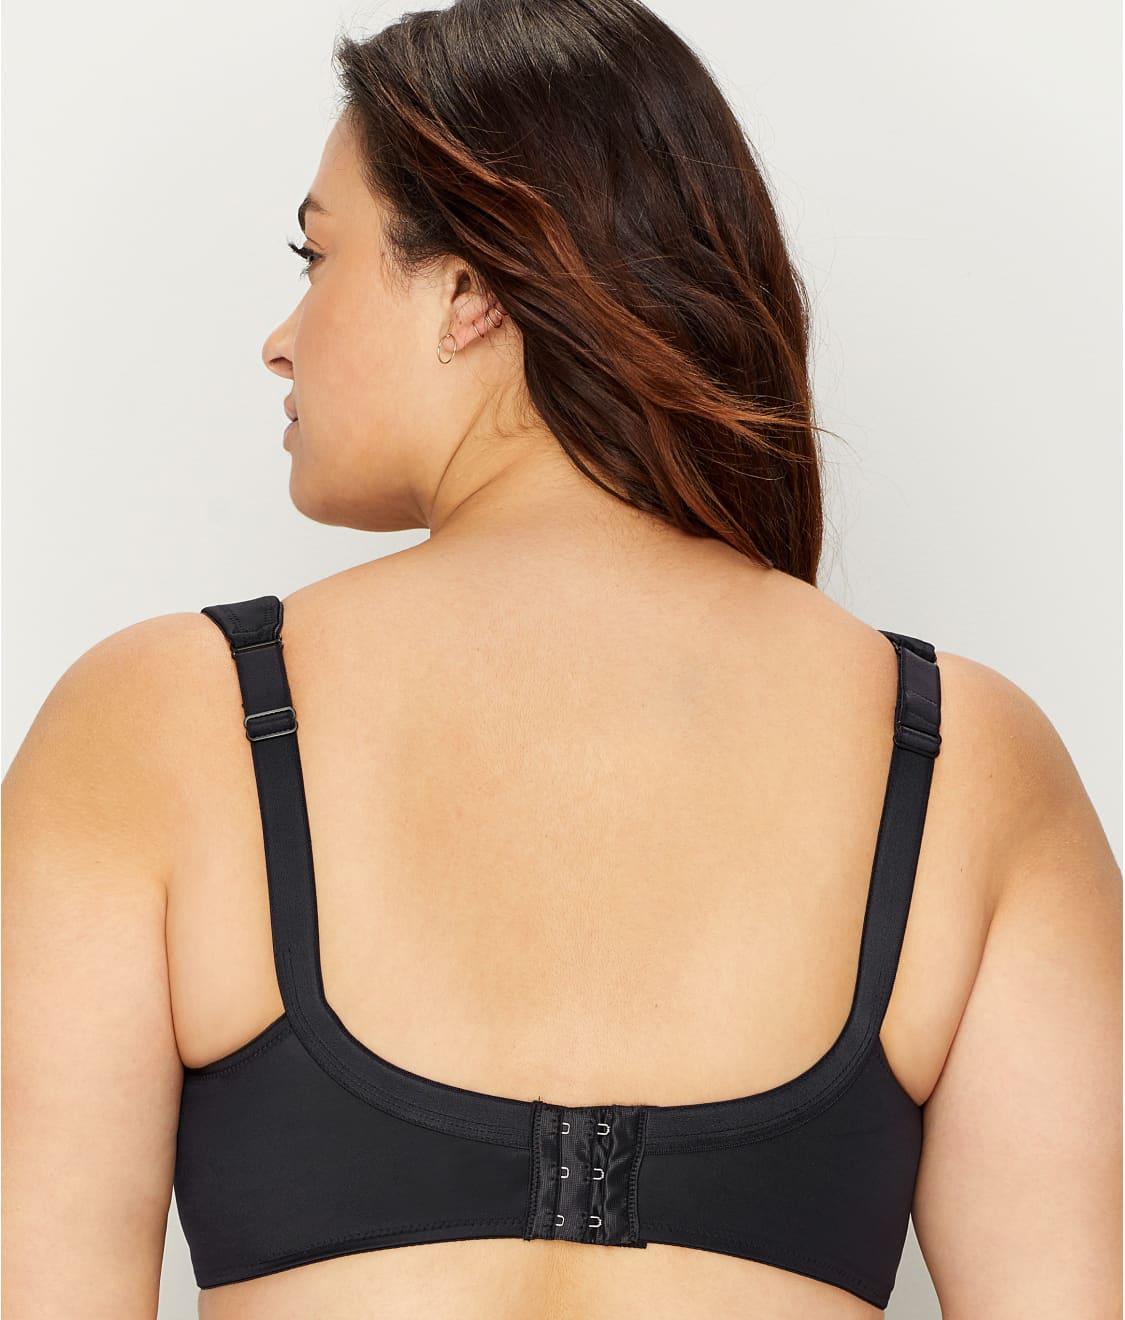 Rosa Faia by Anita *Twin* Seamless Underwired Bra Wide Comfort Straps 5490 Black